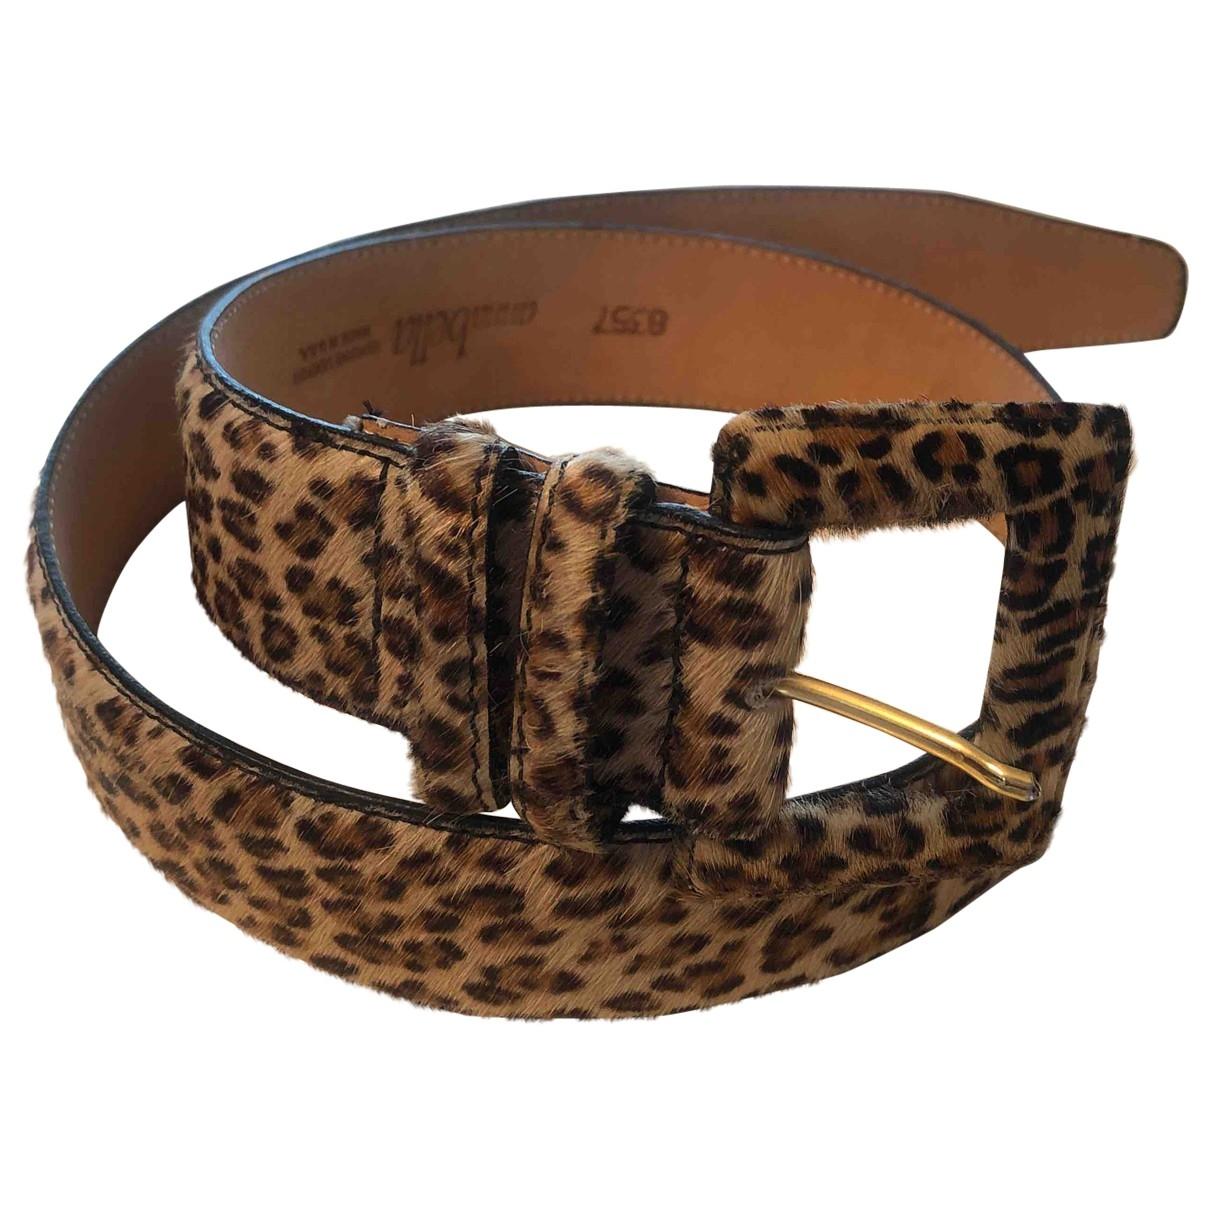 Annabella Pavia \N belt for Women 85 cm